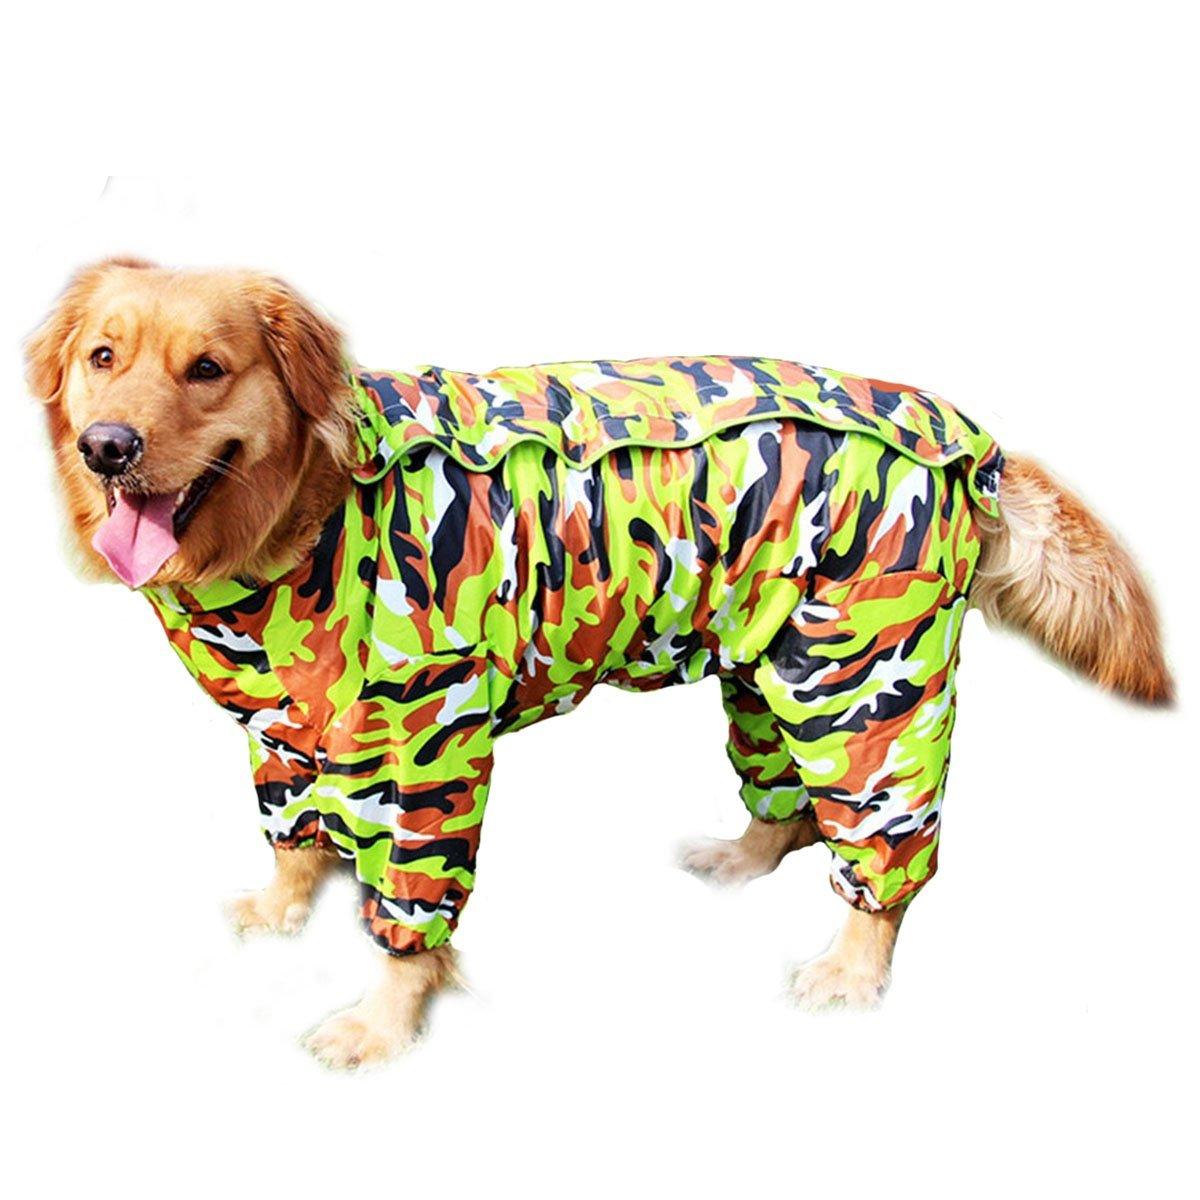 Cane impermeabile Tuta impermeabile a quattro zampe Cani di taglia media e grande Golden retriever Labrador Impermeabile per cani di grossa taglia Vestiti da compagnia impermeabili , pink , 30 shanzhizui